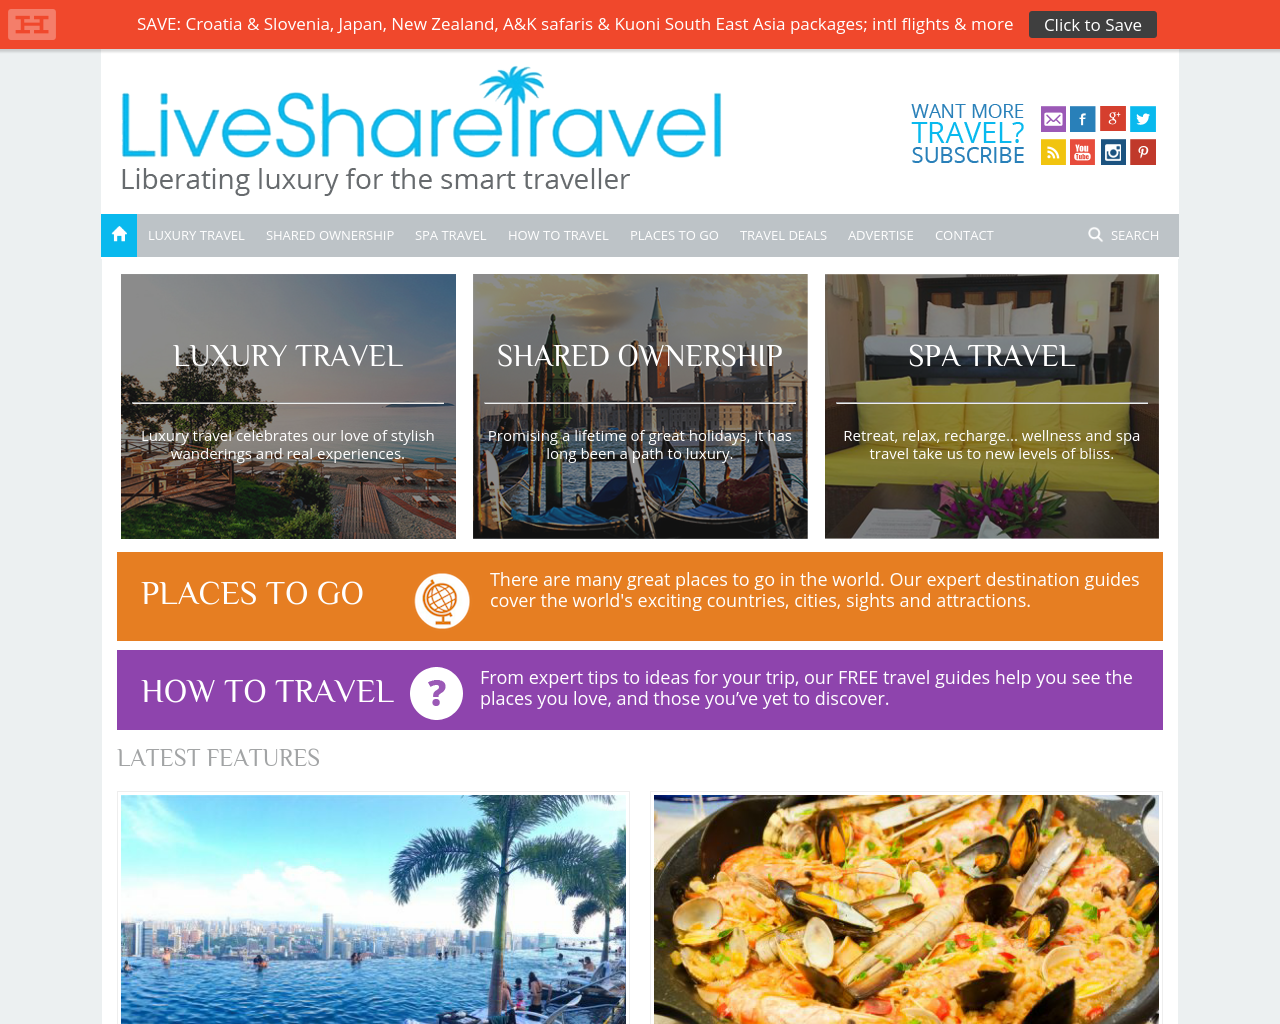 LiveShareTravel-Advertising-Reviews-Pricing